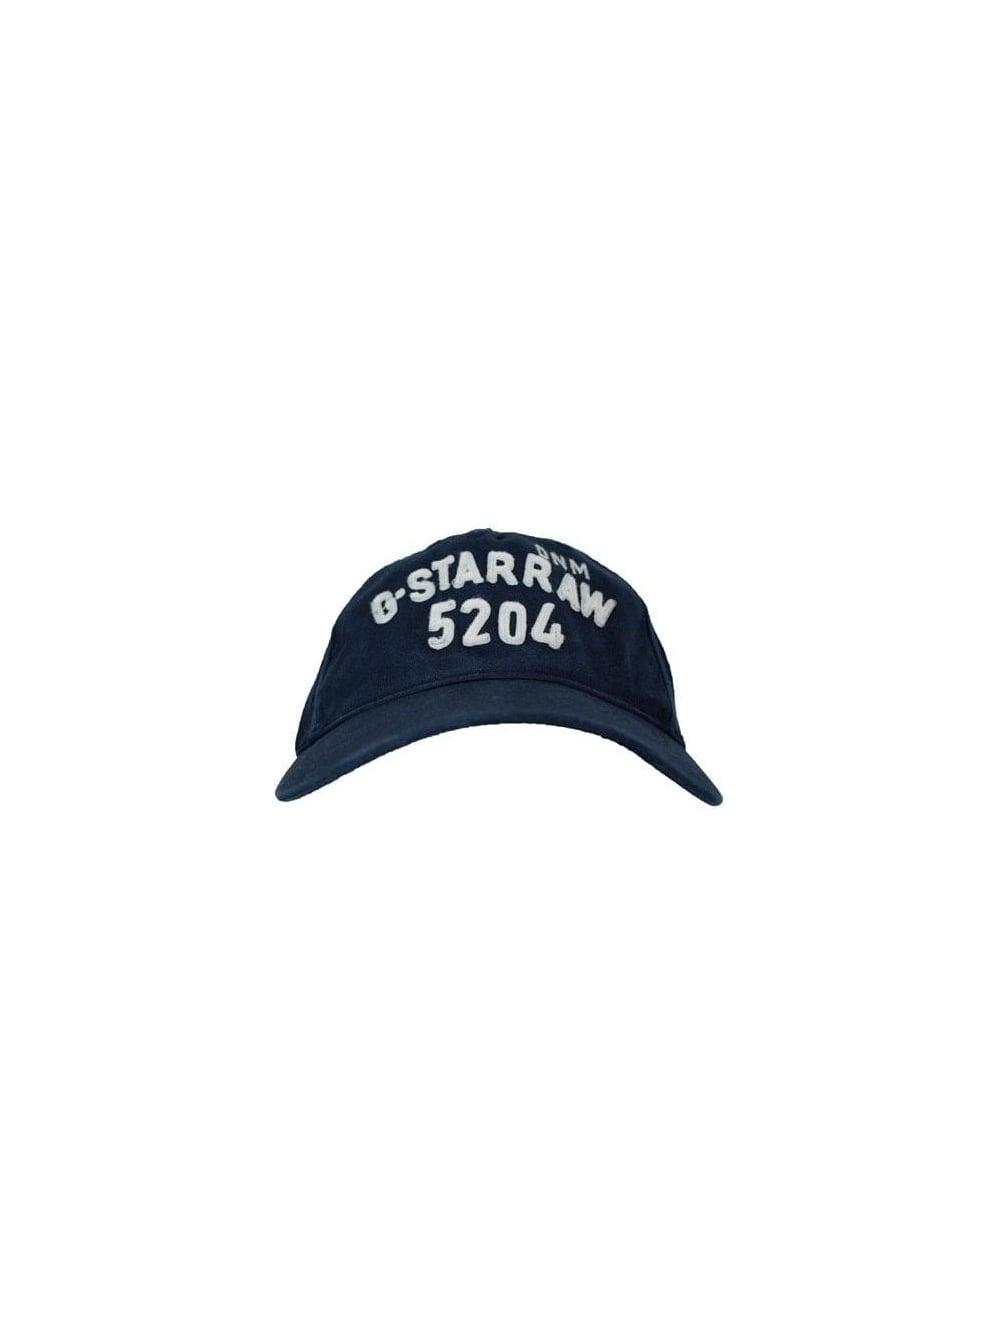 G Star Raw Robert Baseball Cap - Dark Navy - Mens Designer Caps at ... 17e0649672d